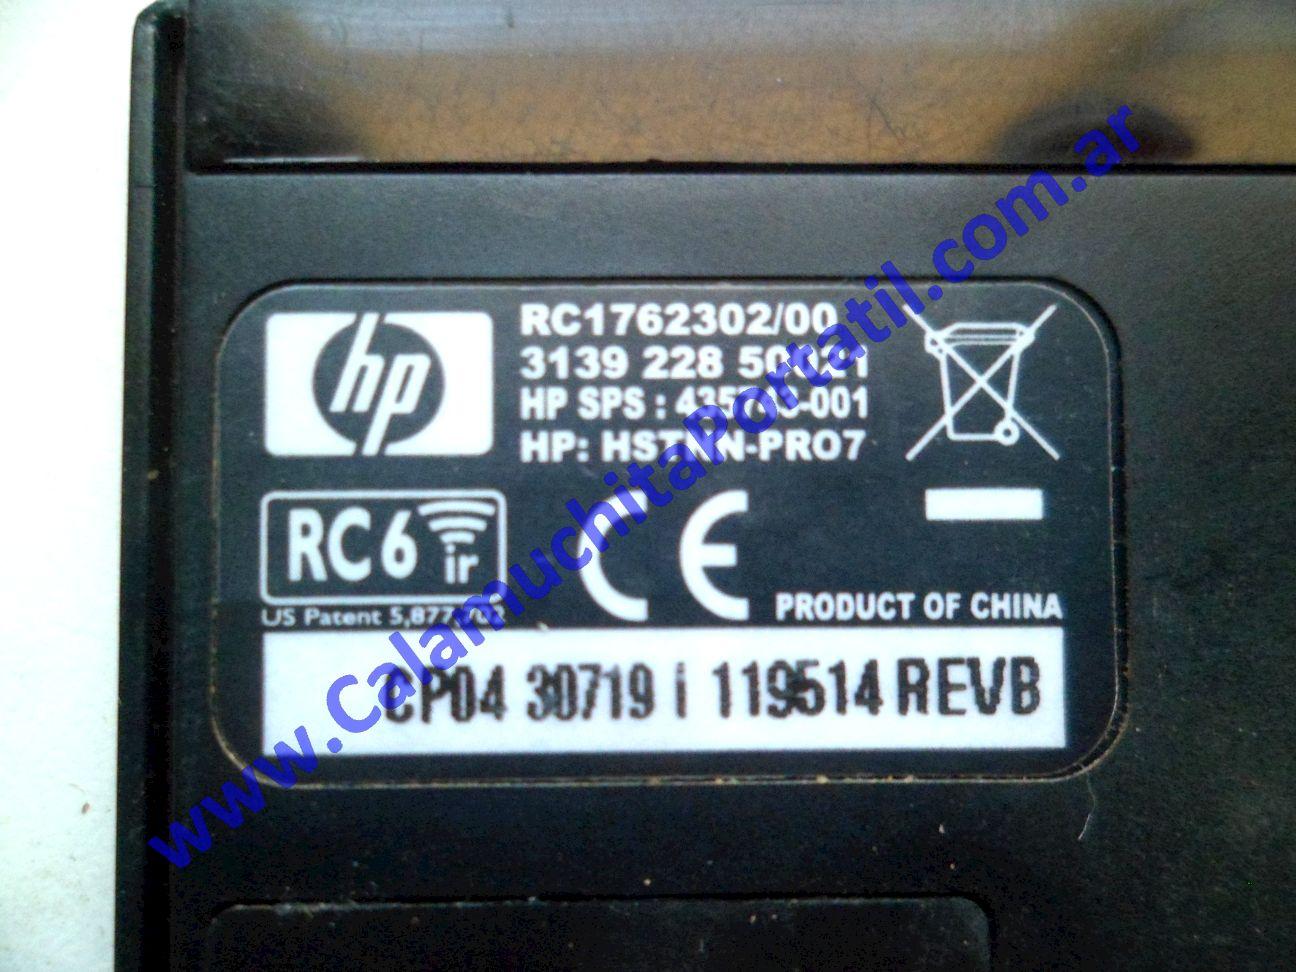 0482ACR Control Remoto Hewlett Packard Pavilion dv9500 / GA341UA#ABA